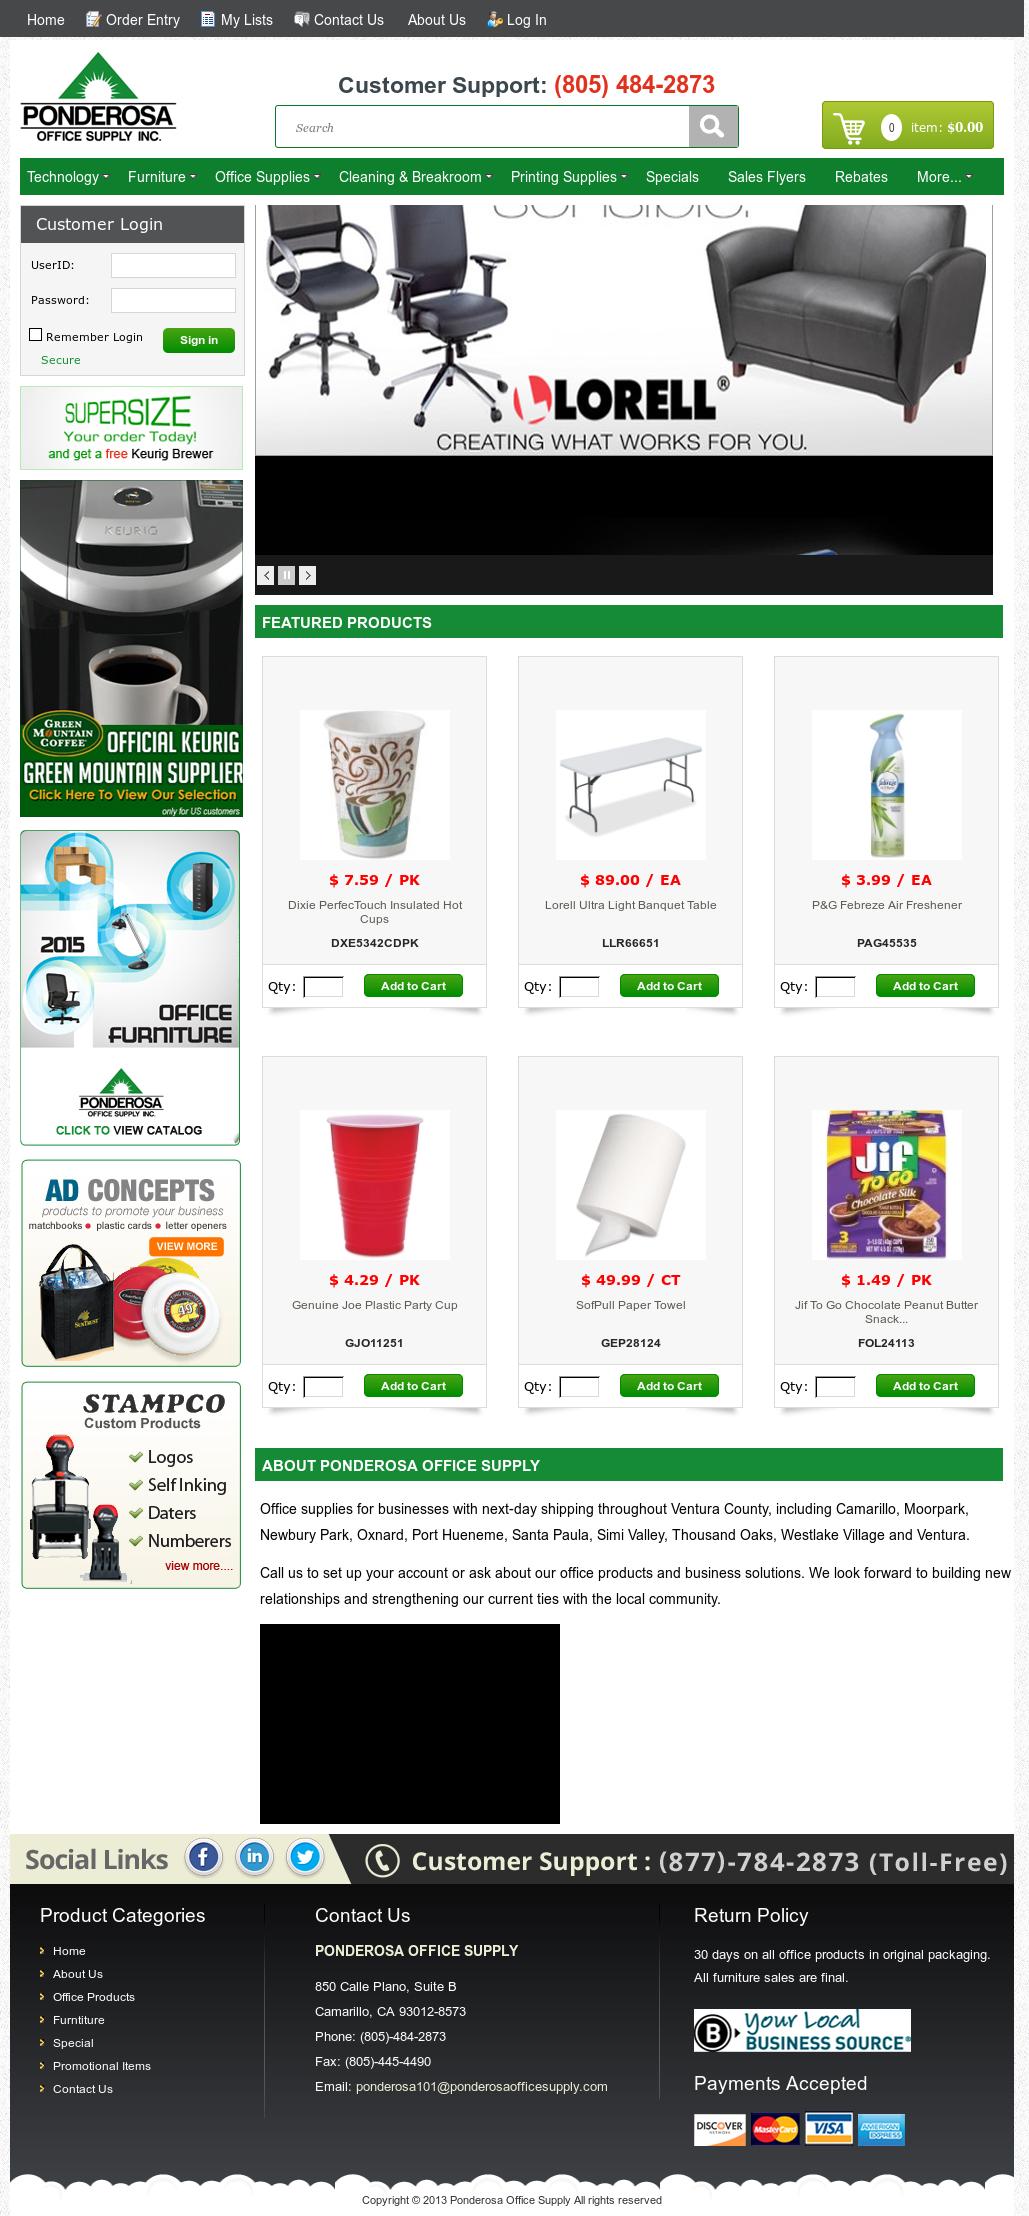 Ponderosa Office Supply Website History